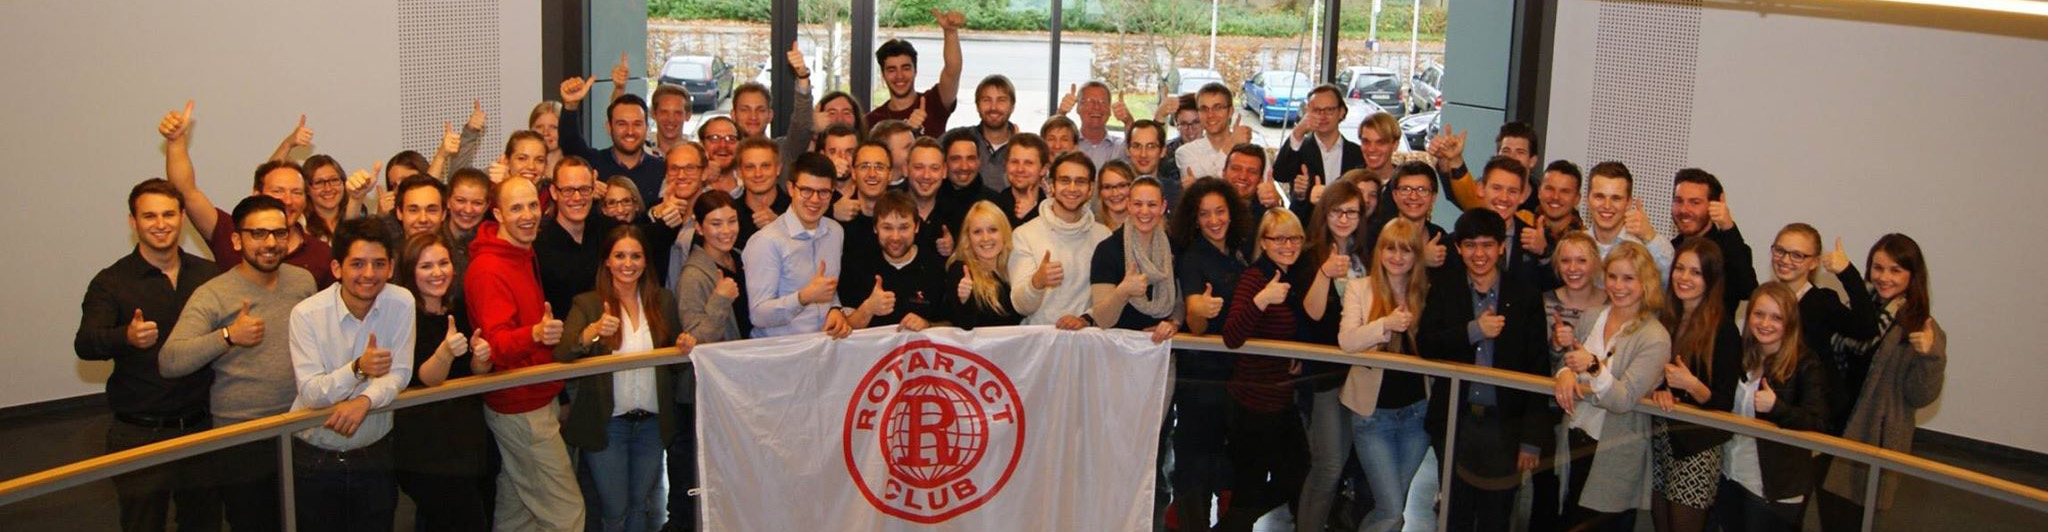 Rotaract Club Rheda-Wiedenbrück